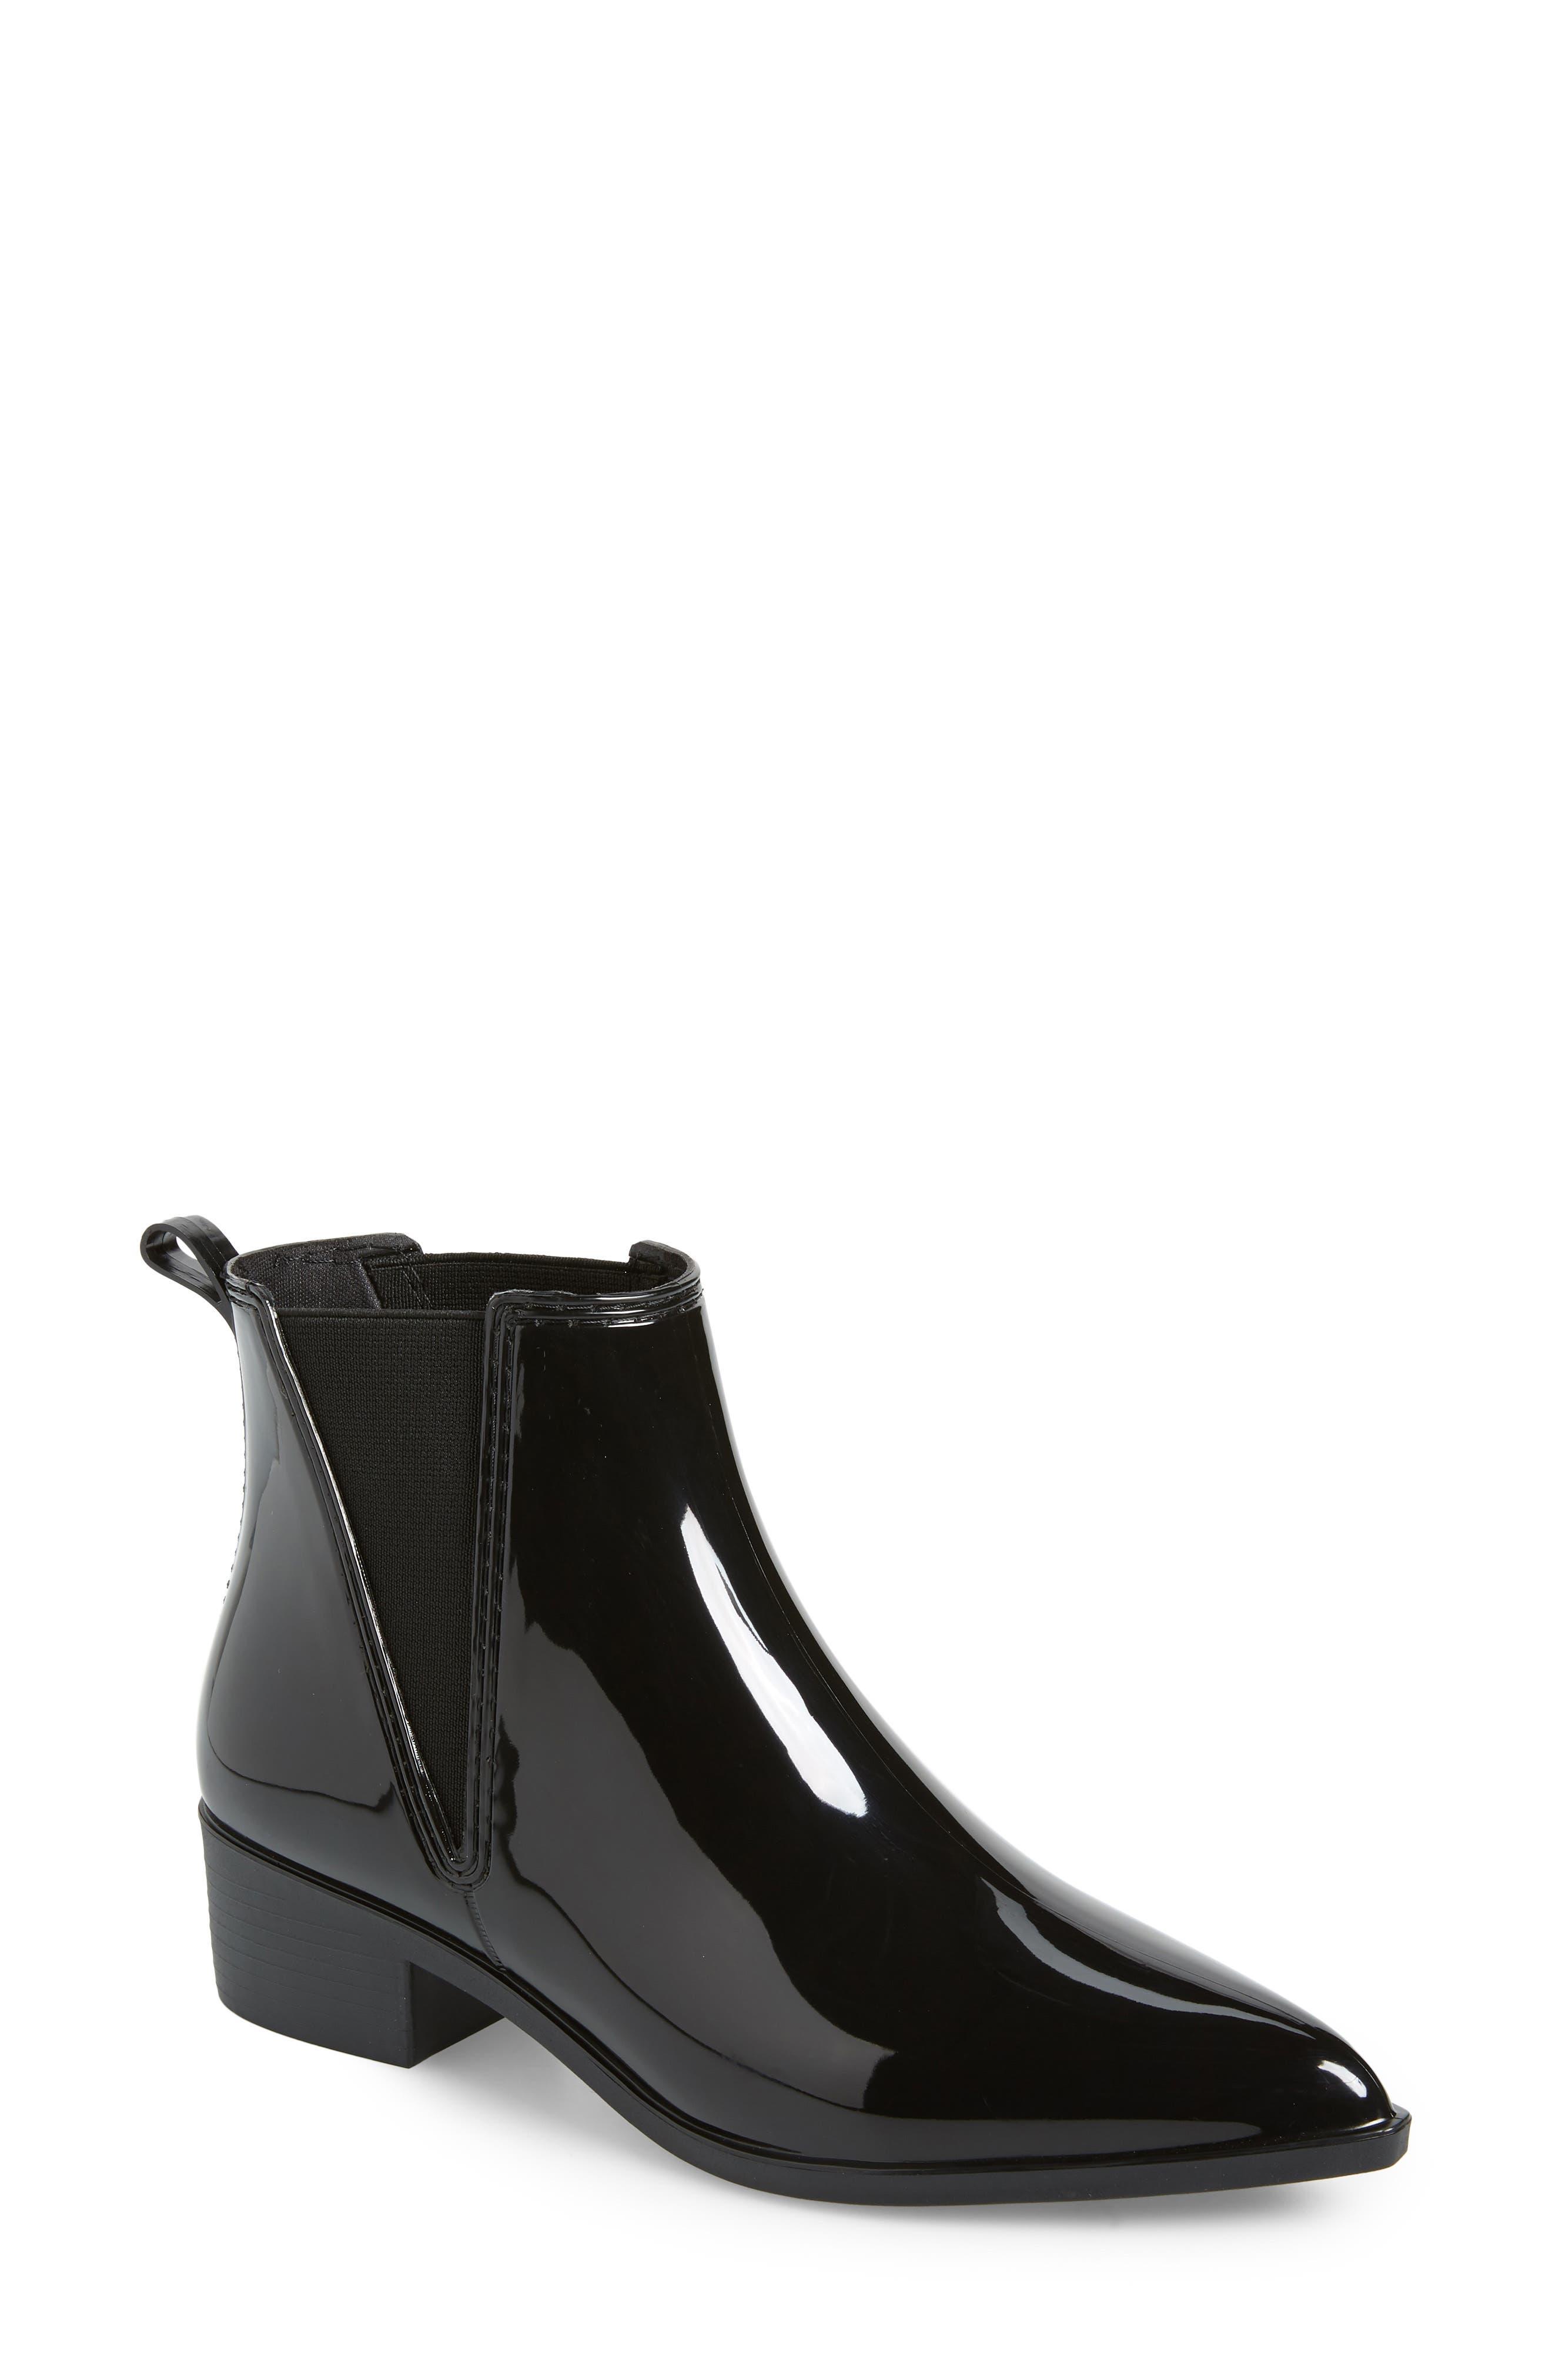 Jeffrey Campbell Mist Chelsea Waterproof Rain Boot, Black